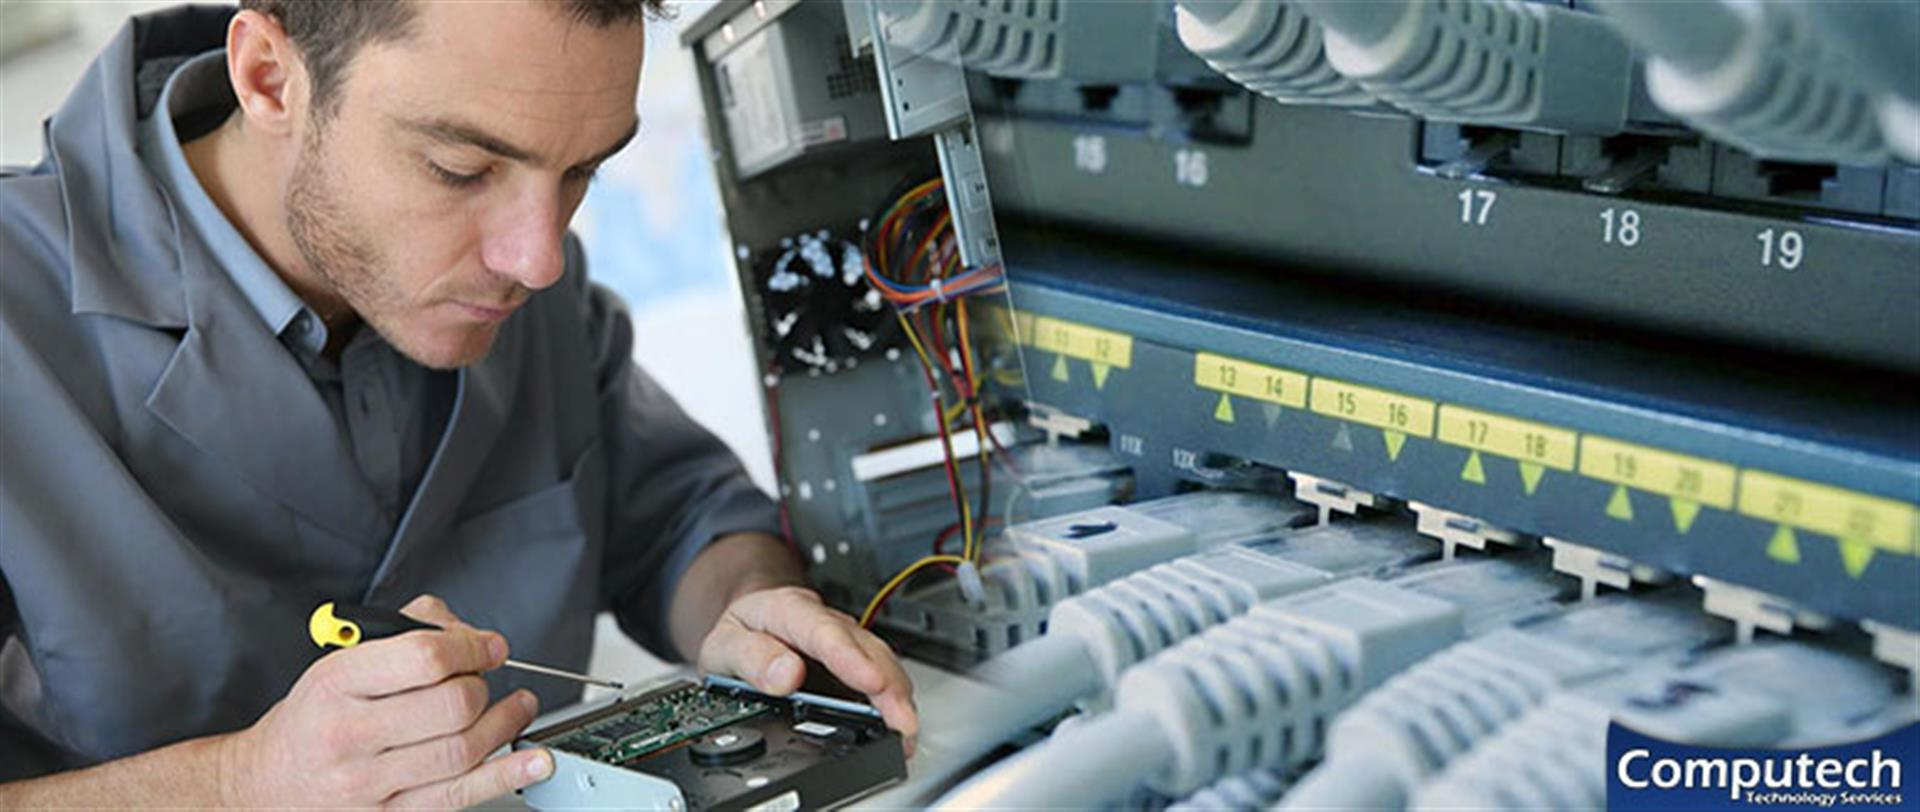 Lake Havasu City Arizona On Site Computer & Printer Repairs, Network, Telecom and Broadband Data Cabling Services